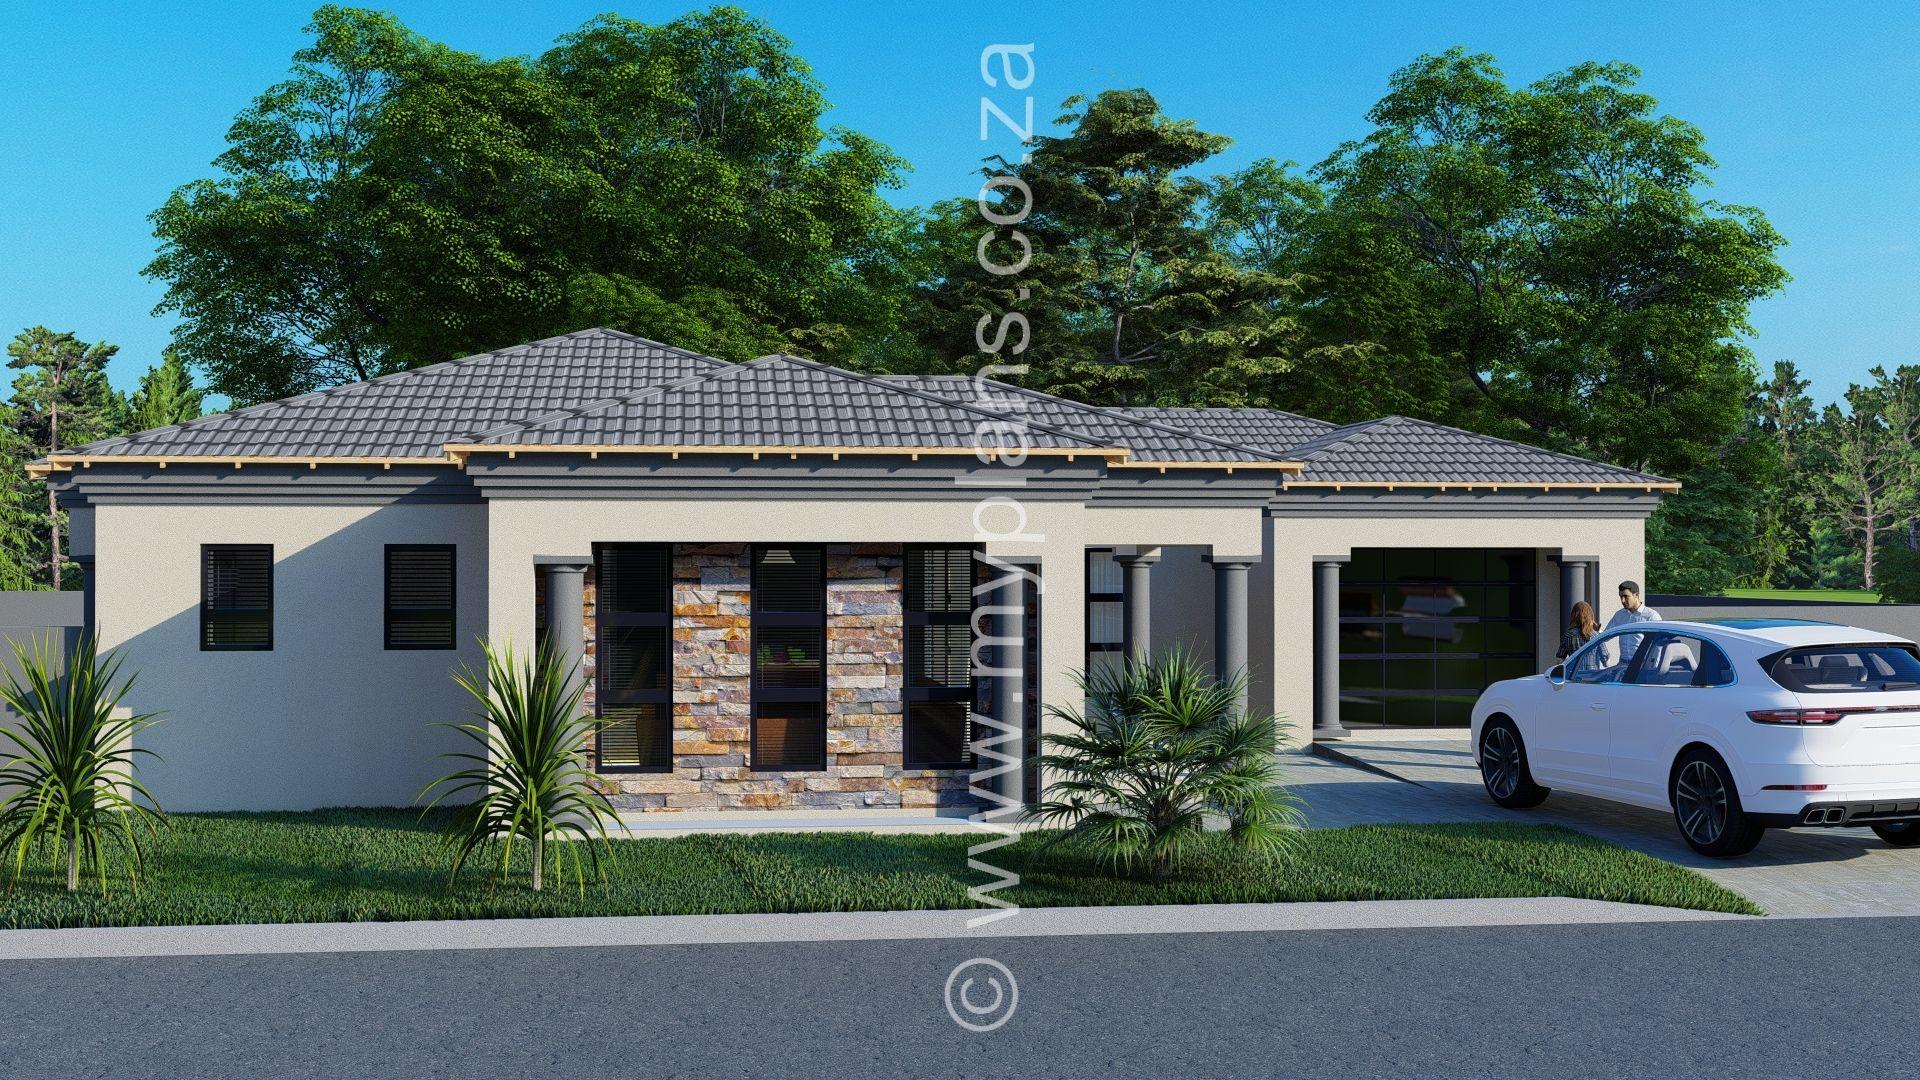 3 Bedroom House Plan Mlb 008 1s Bedroom House Plans My House Plans 3 Bedroom House